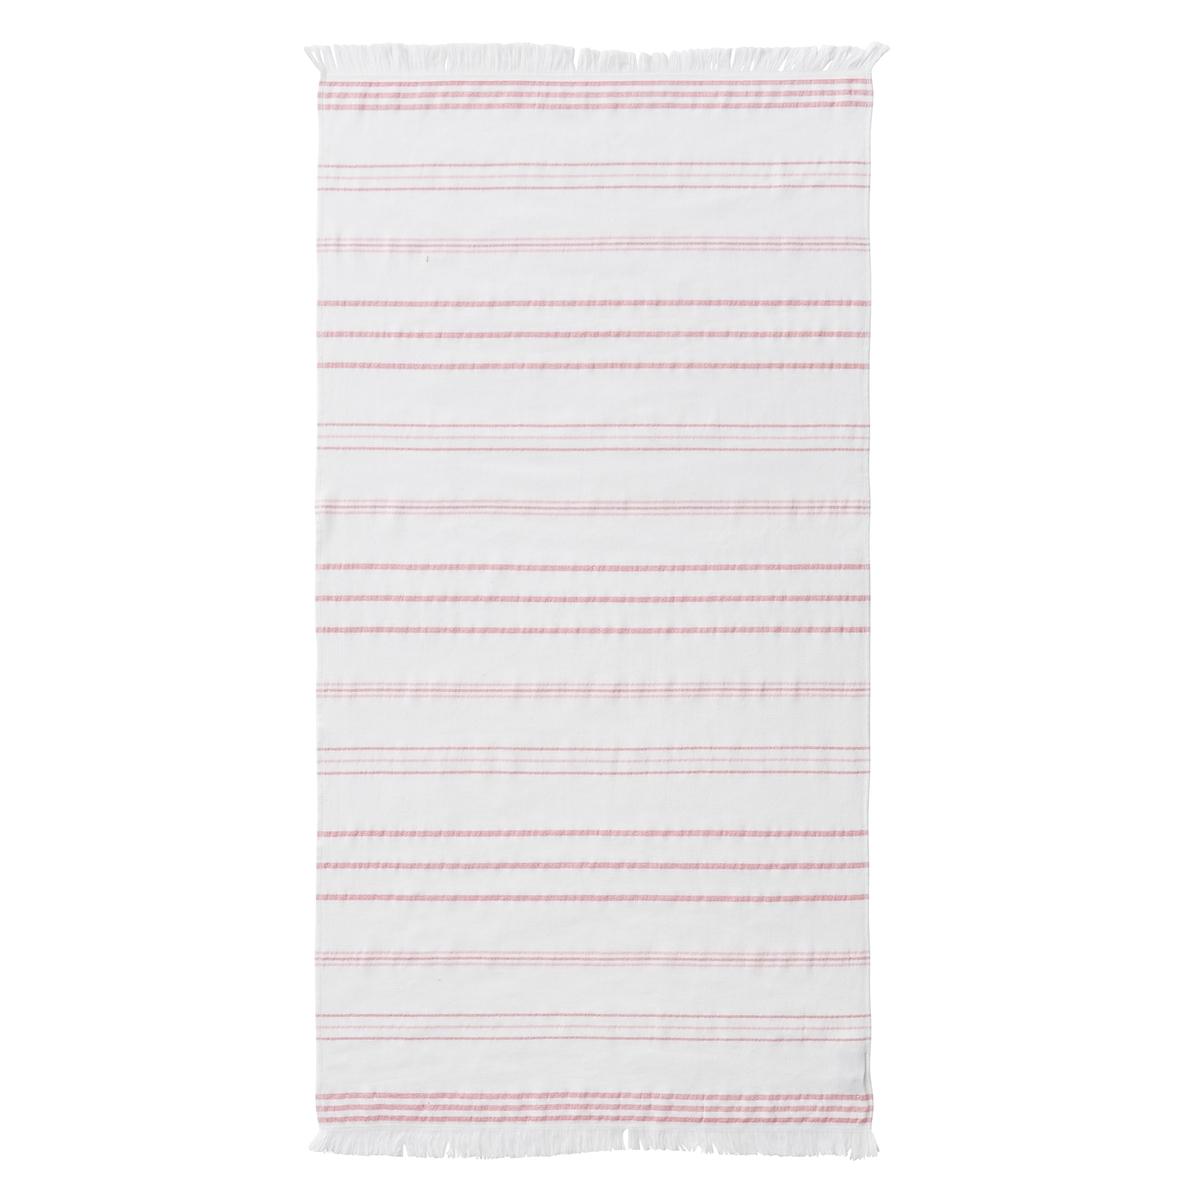 Полотенце пляжное Isparta полотенца virginia secret полотенце laura набор